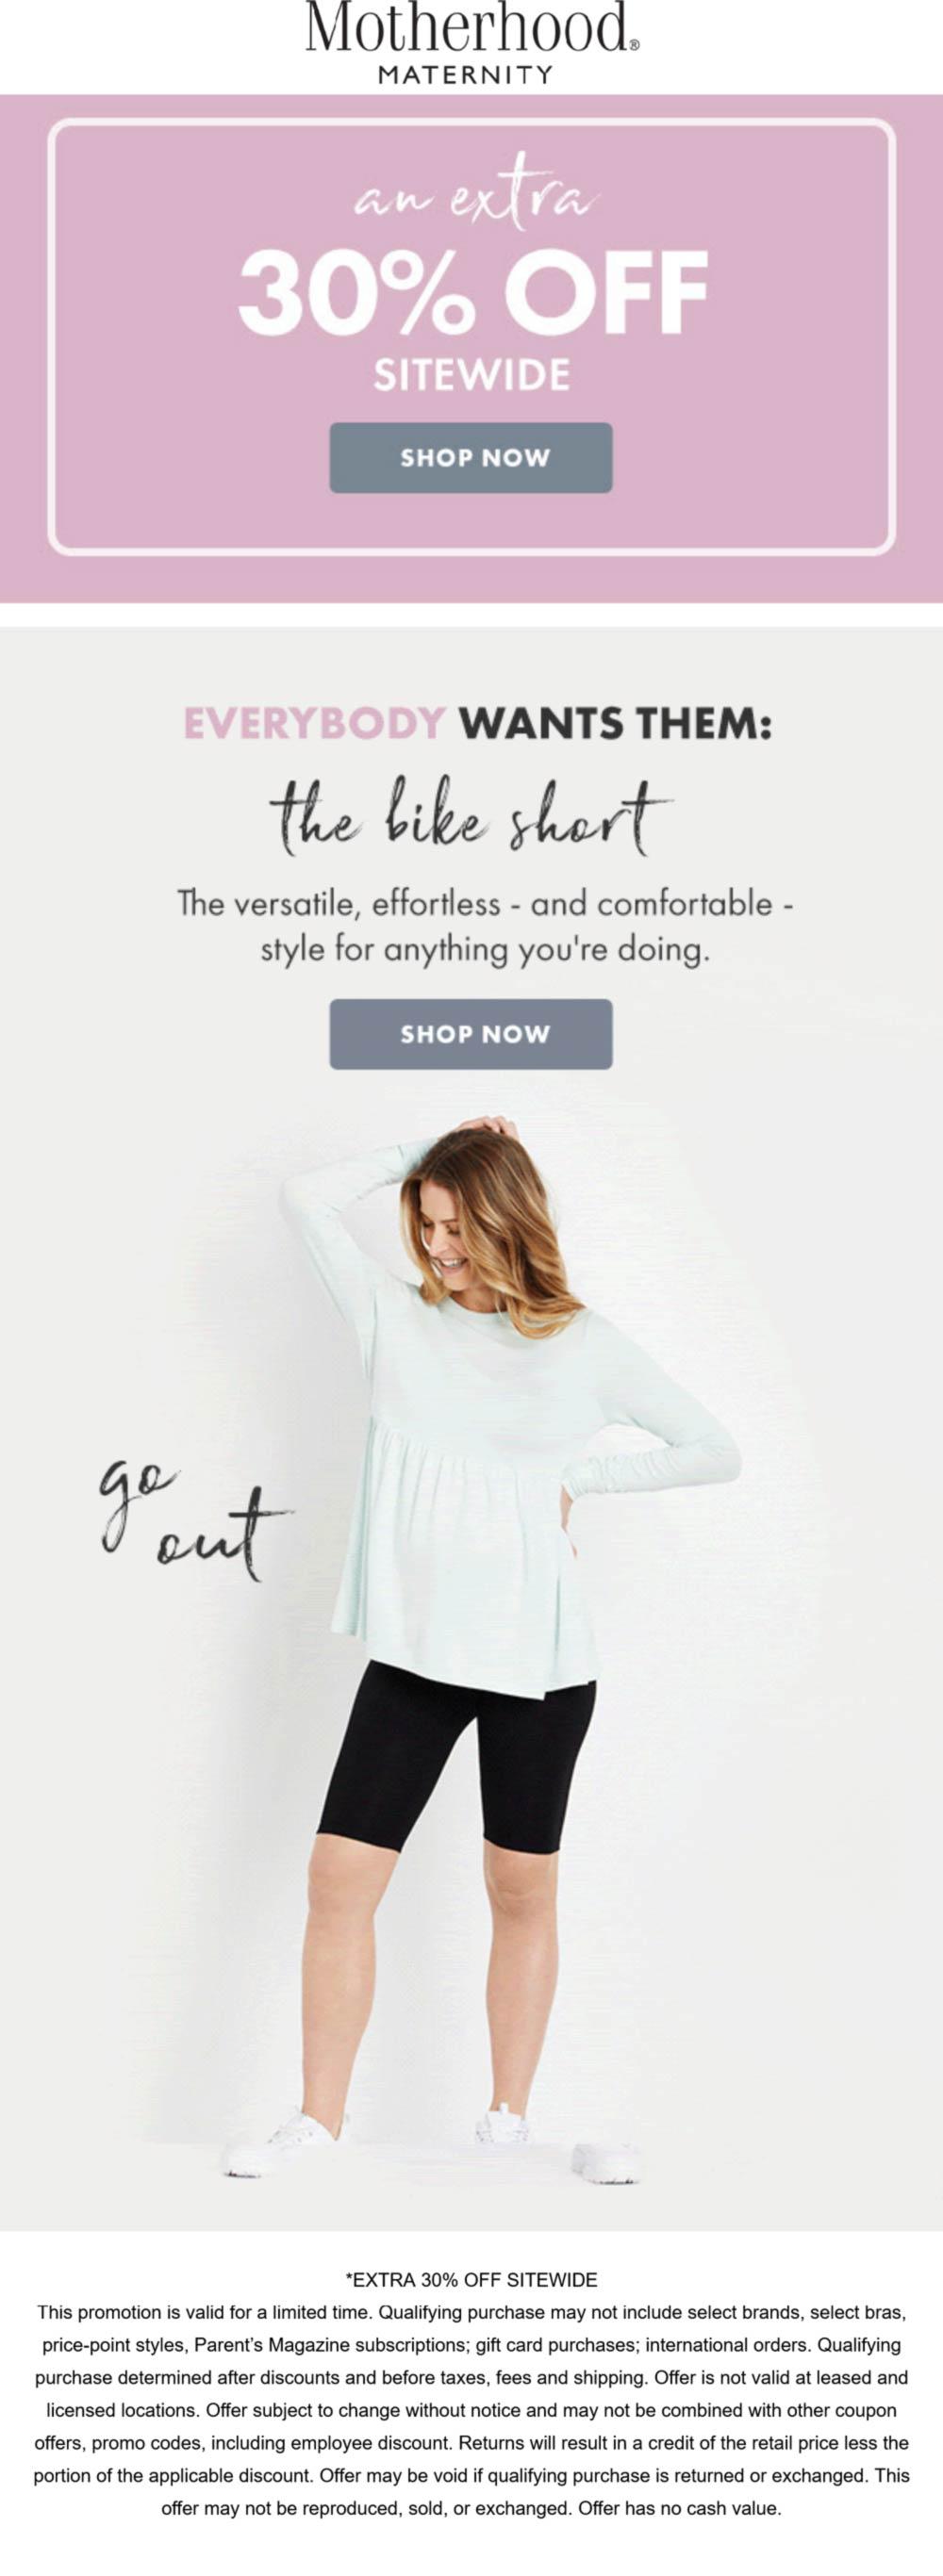 Motherhood Maternity coupons & promo code for [September 2021]